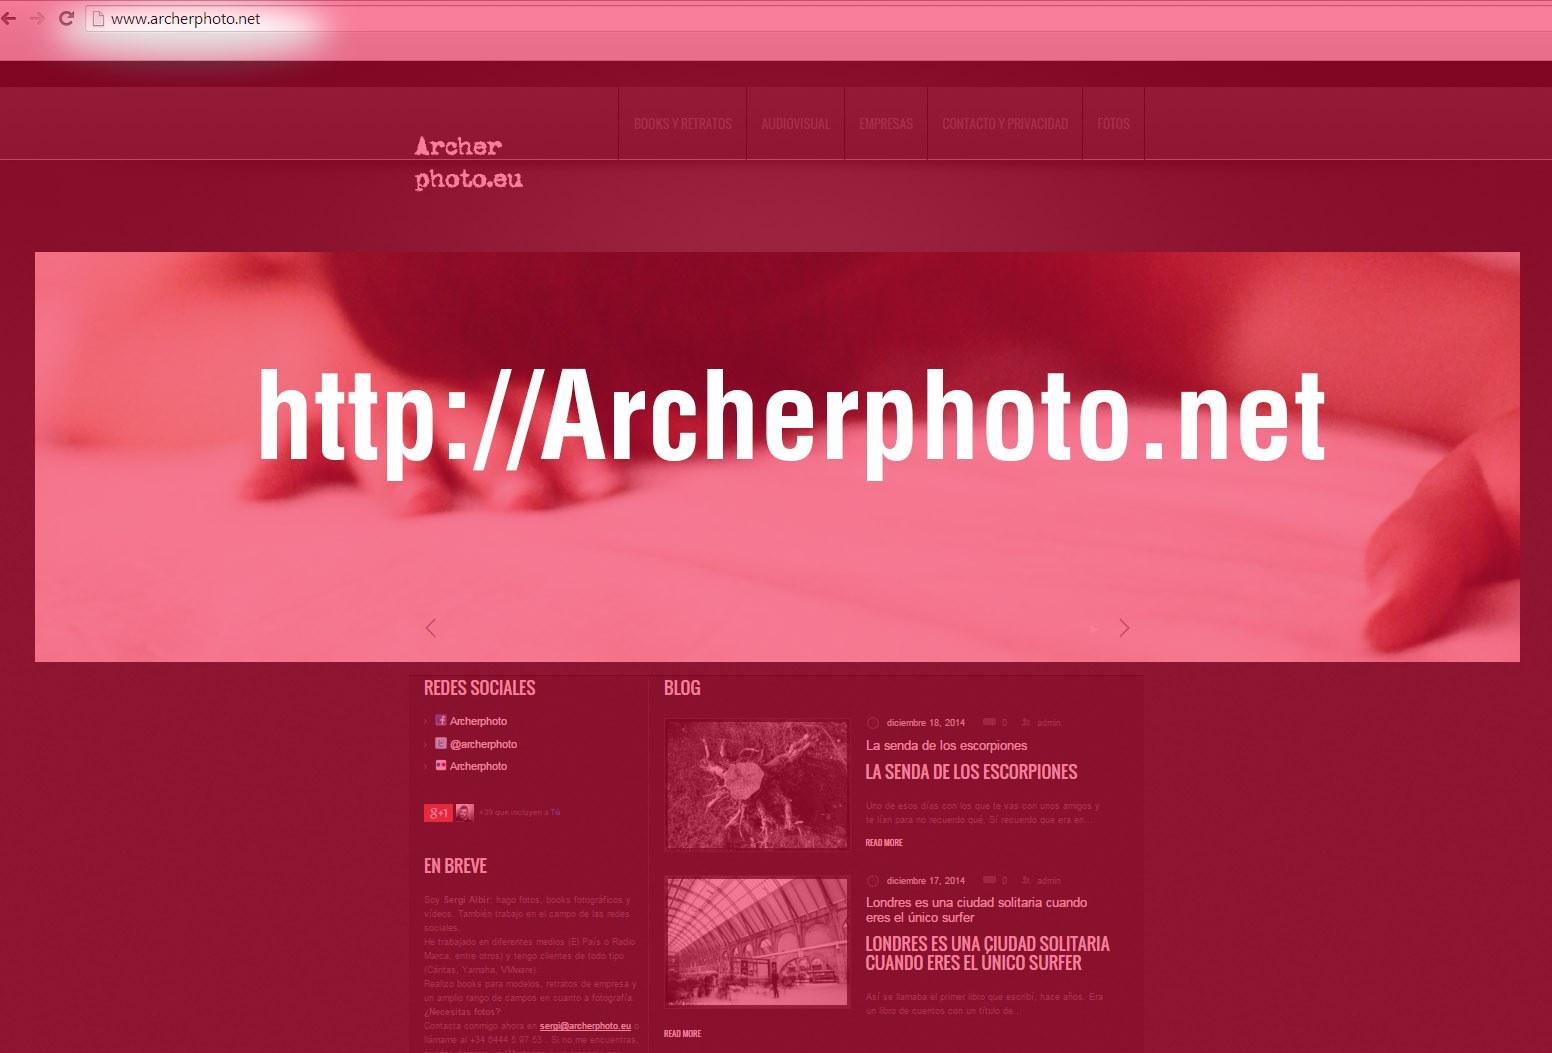 Archerphoto.net